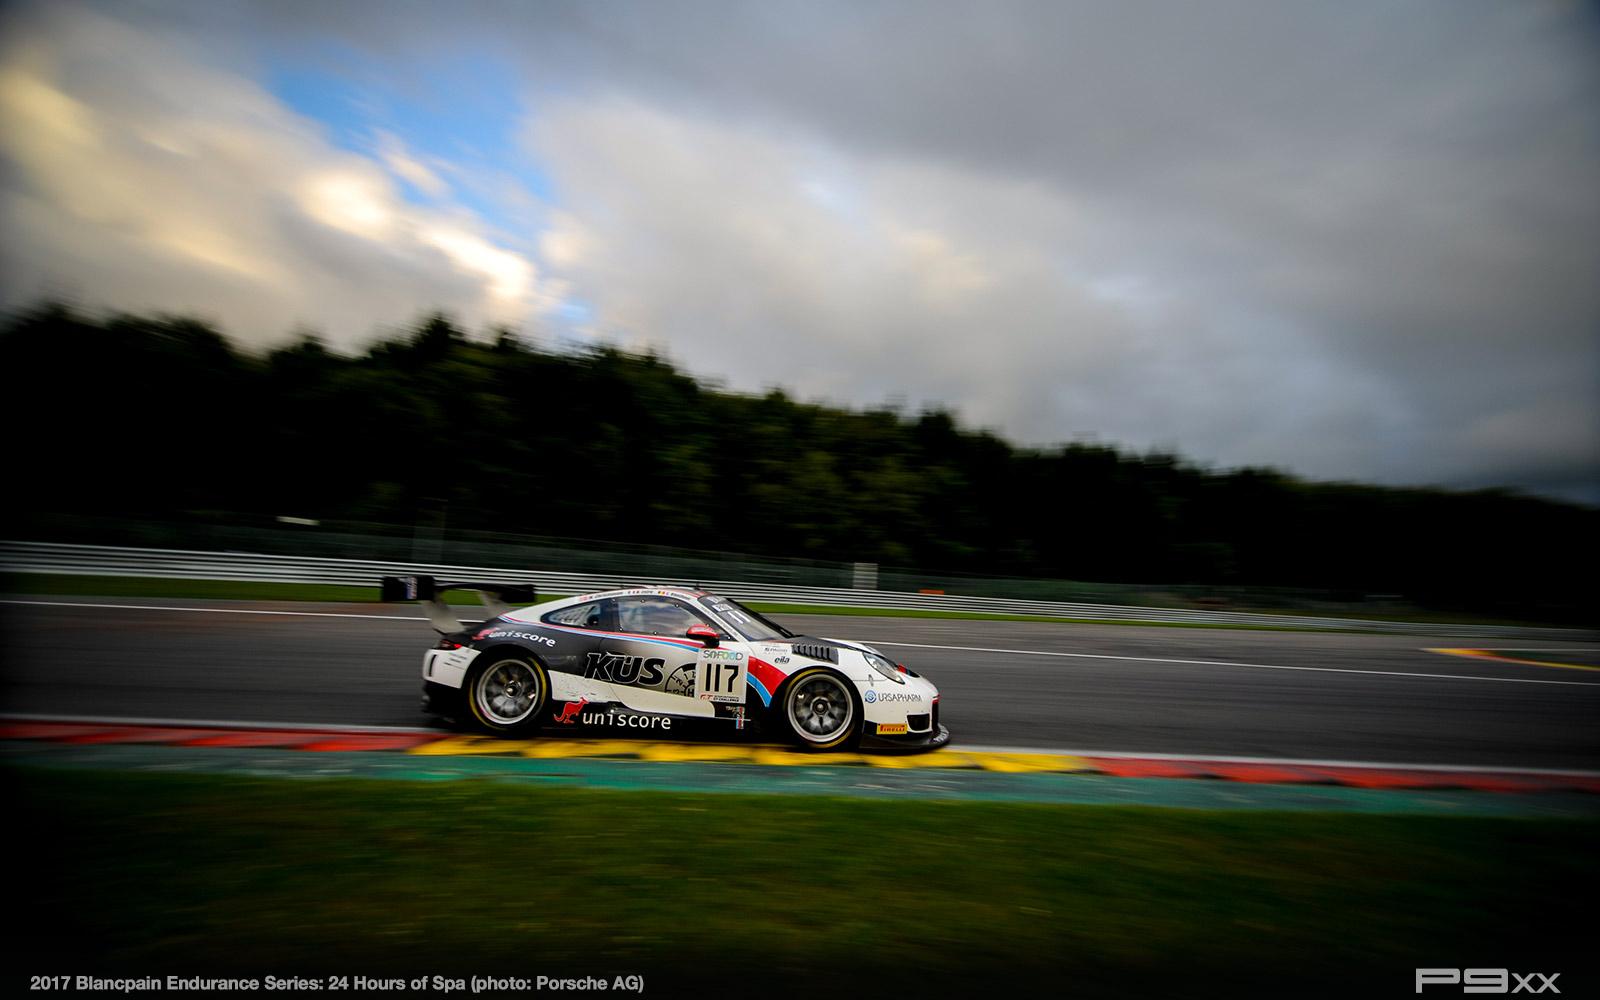 2017-24-Hours-of-Spa-Porsche-320